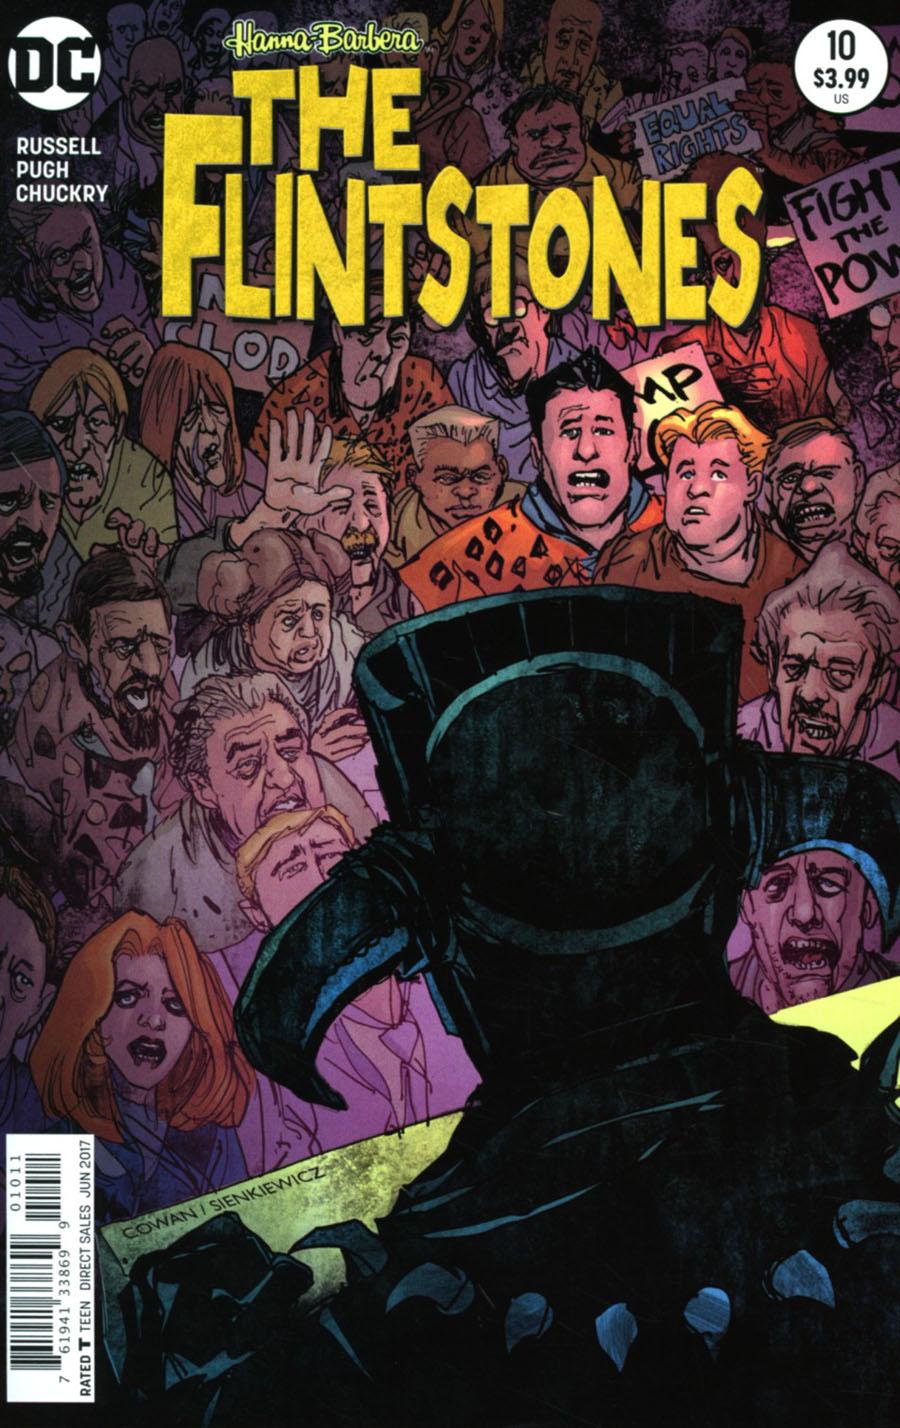 Flintstones (DC) #10 Cover A Regular Denys Cowan & Bill Sienkiewicz Cover